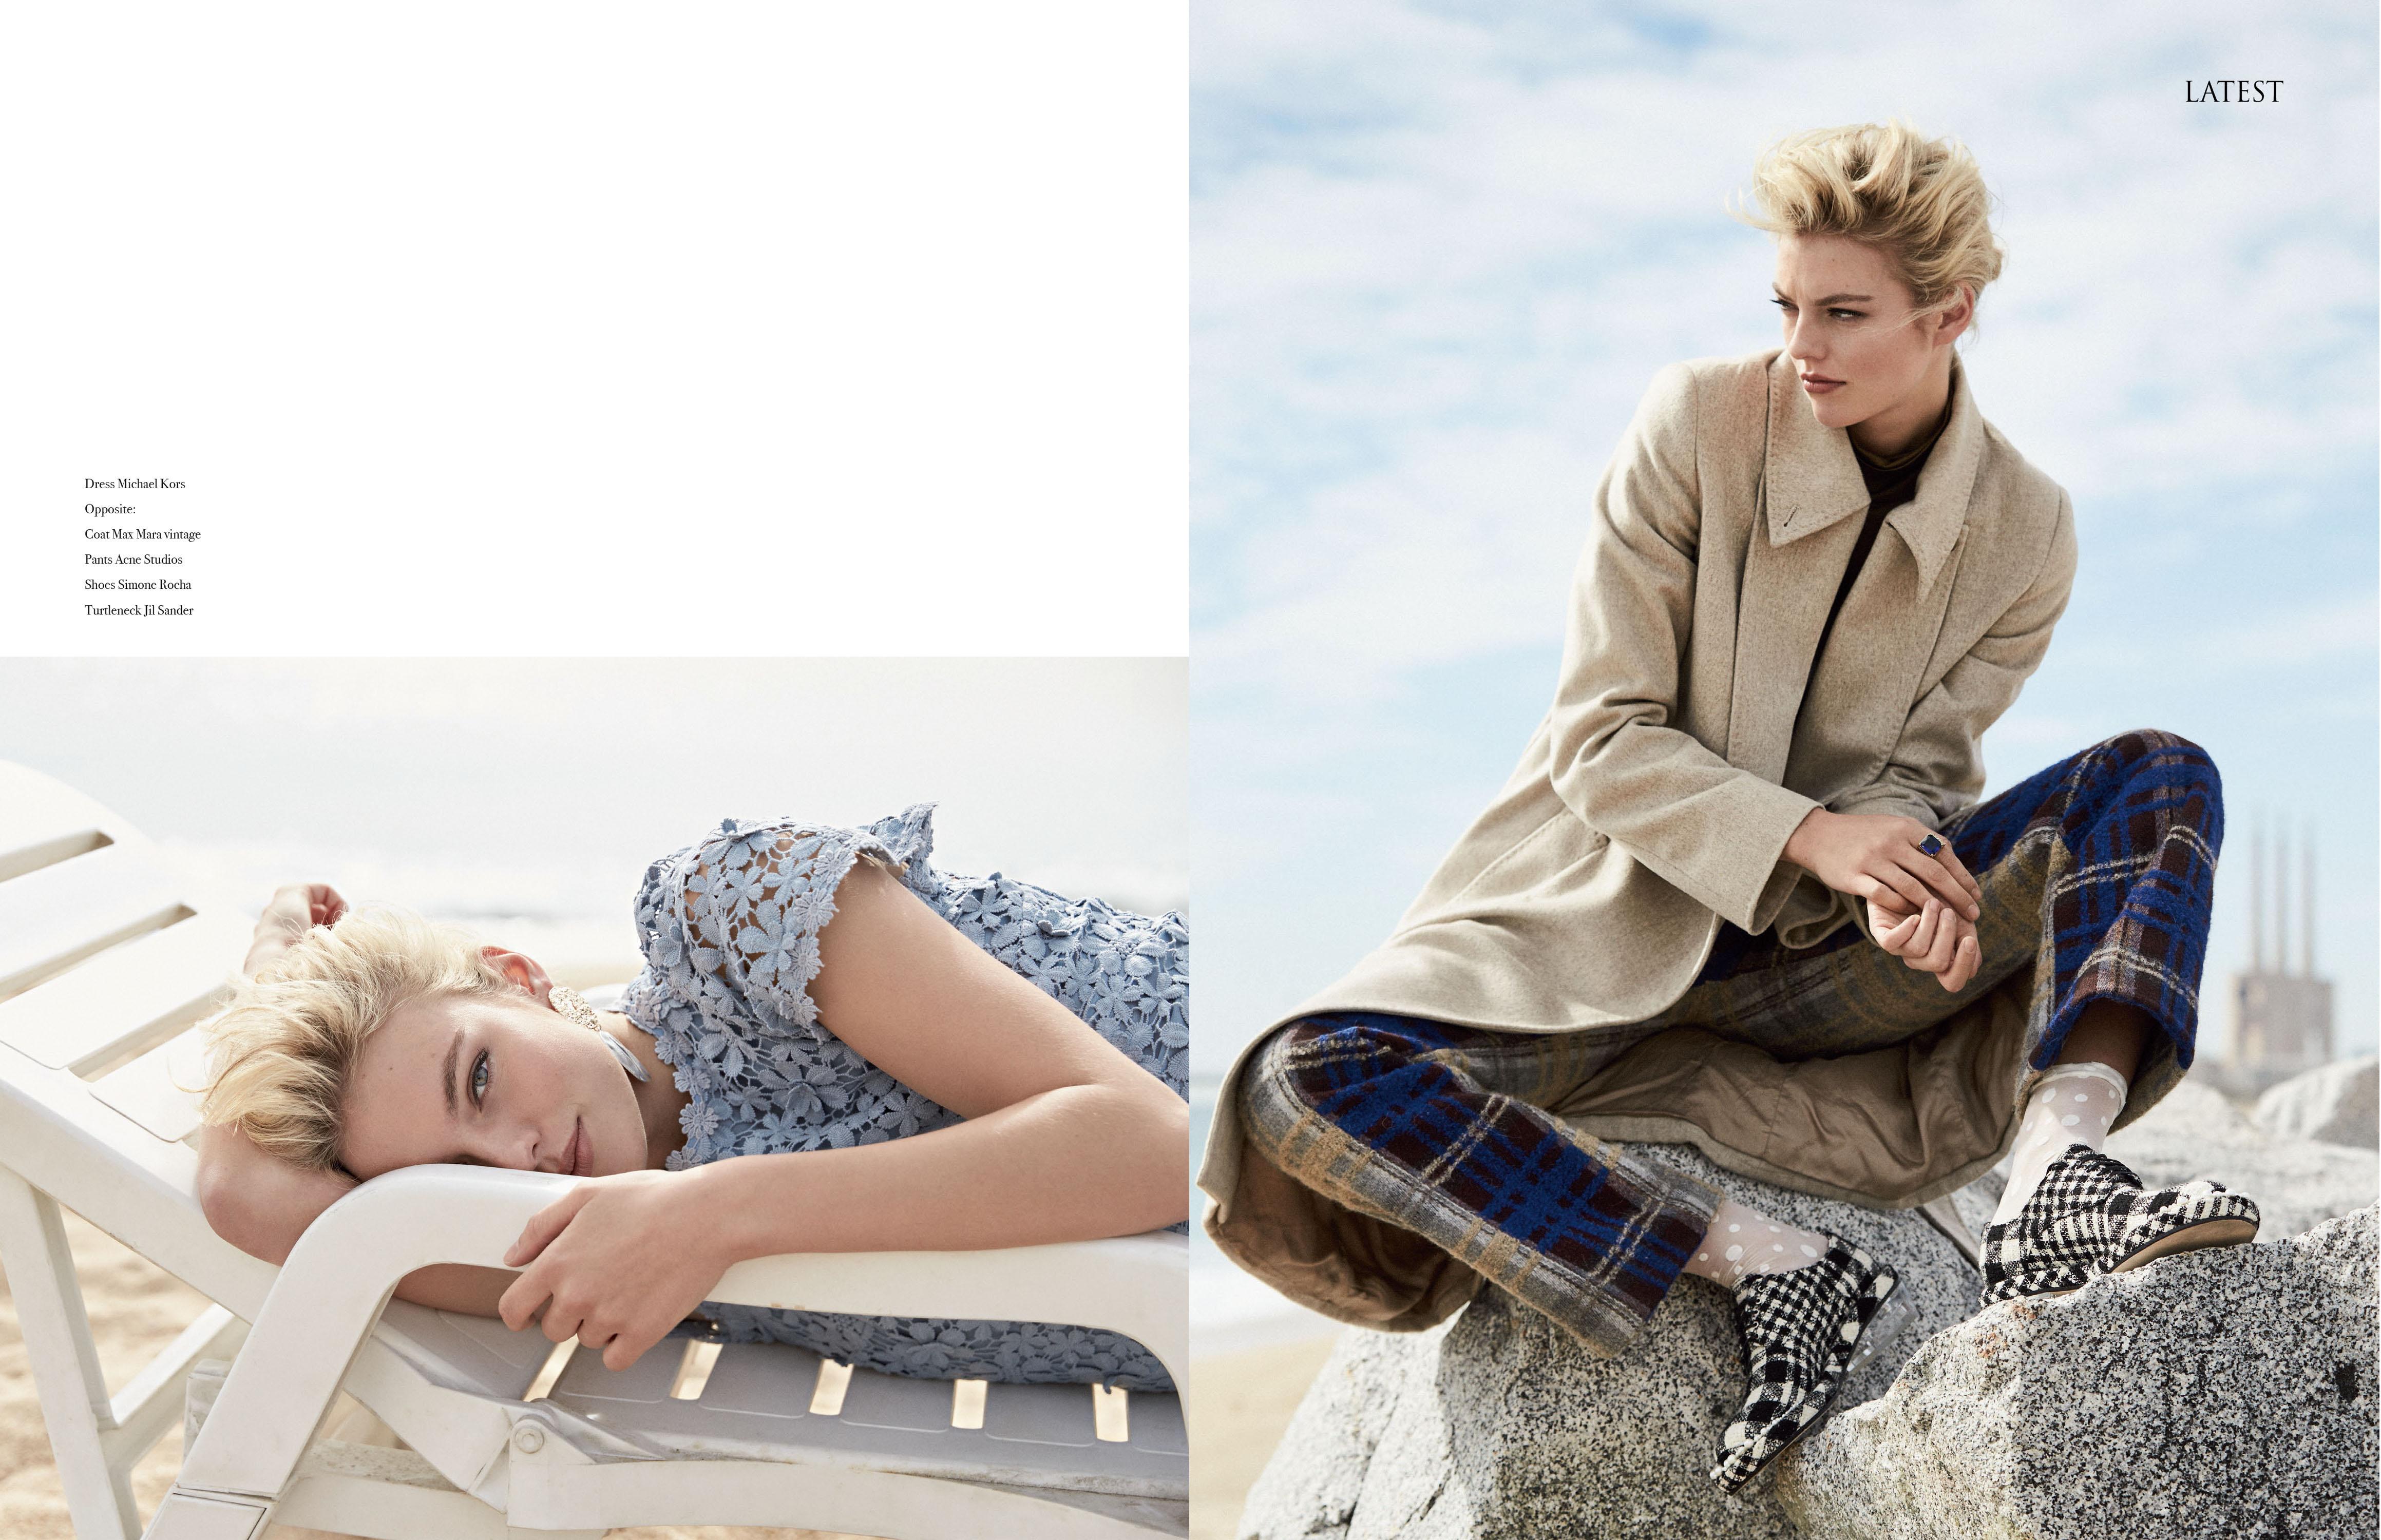 detlef schneider photography, fashion editorial, sepia beach, barcelona